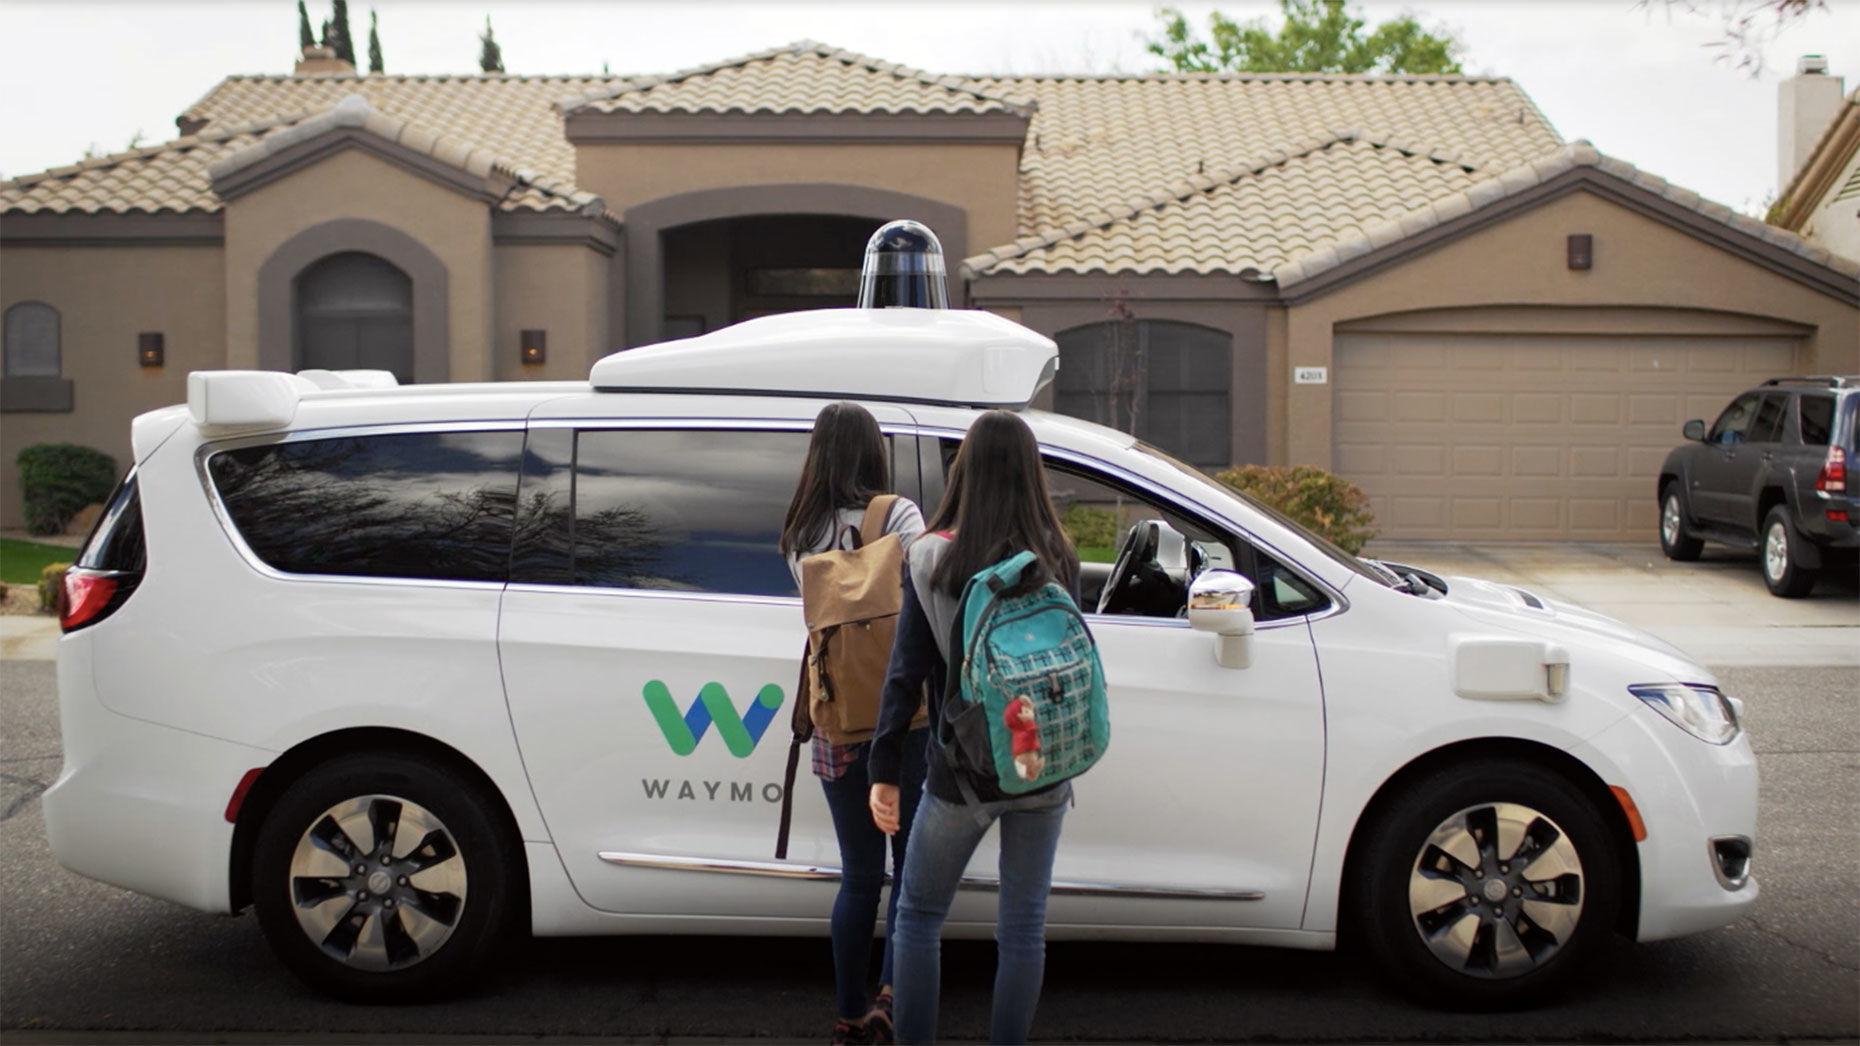 Waymo's Backseat Drivers: Confidential Data Reveals Self